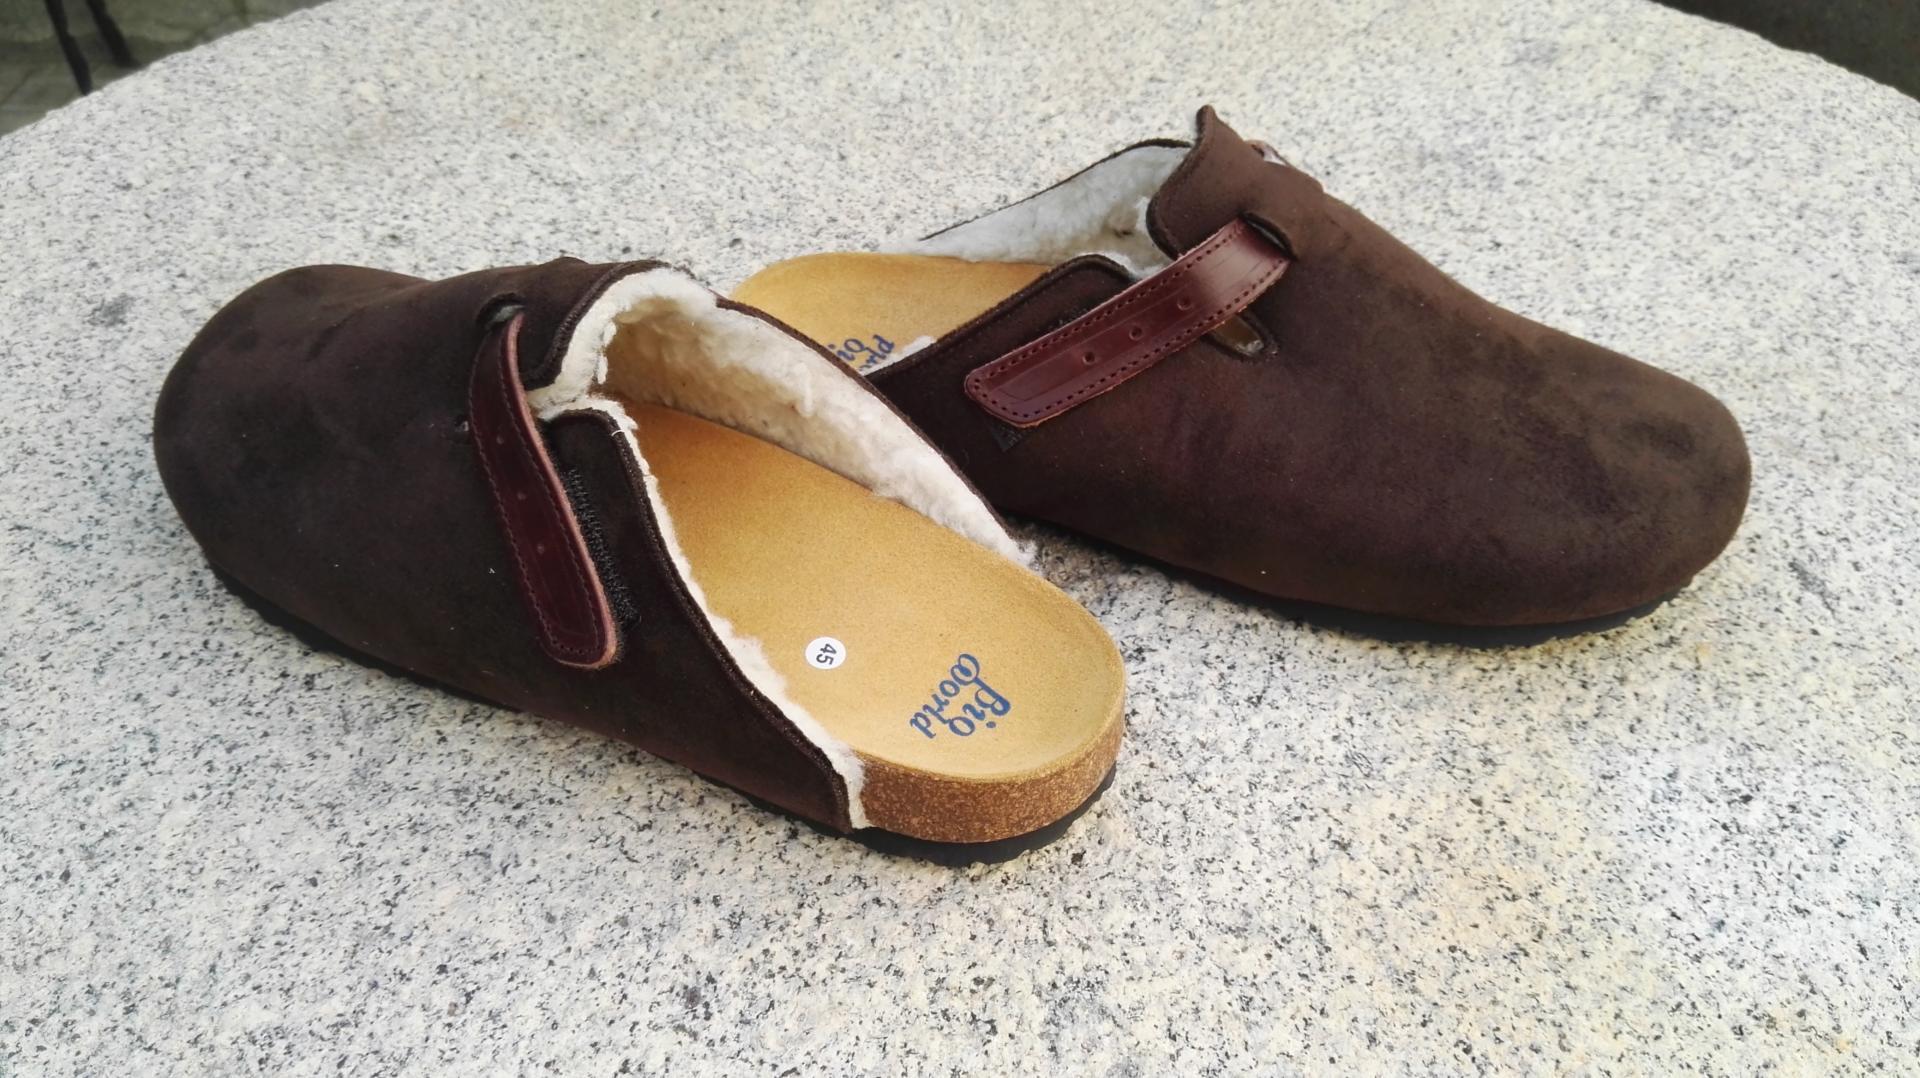 FINLANDIA MARRÓN Zapatos veganos, Zapatos de diseño, Zapatos abiertos, Zapatos Planos, zapatos de hombre, zapatos de mujer